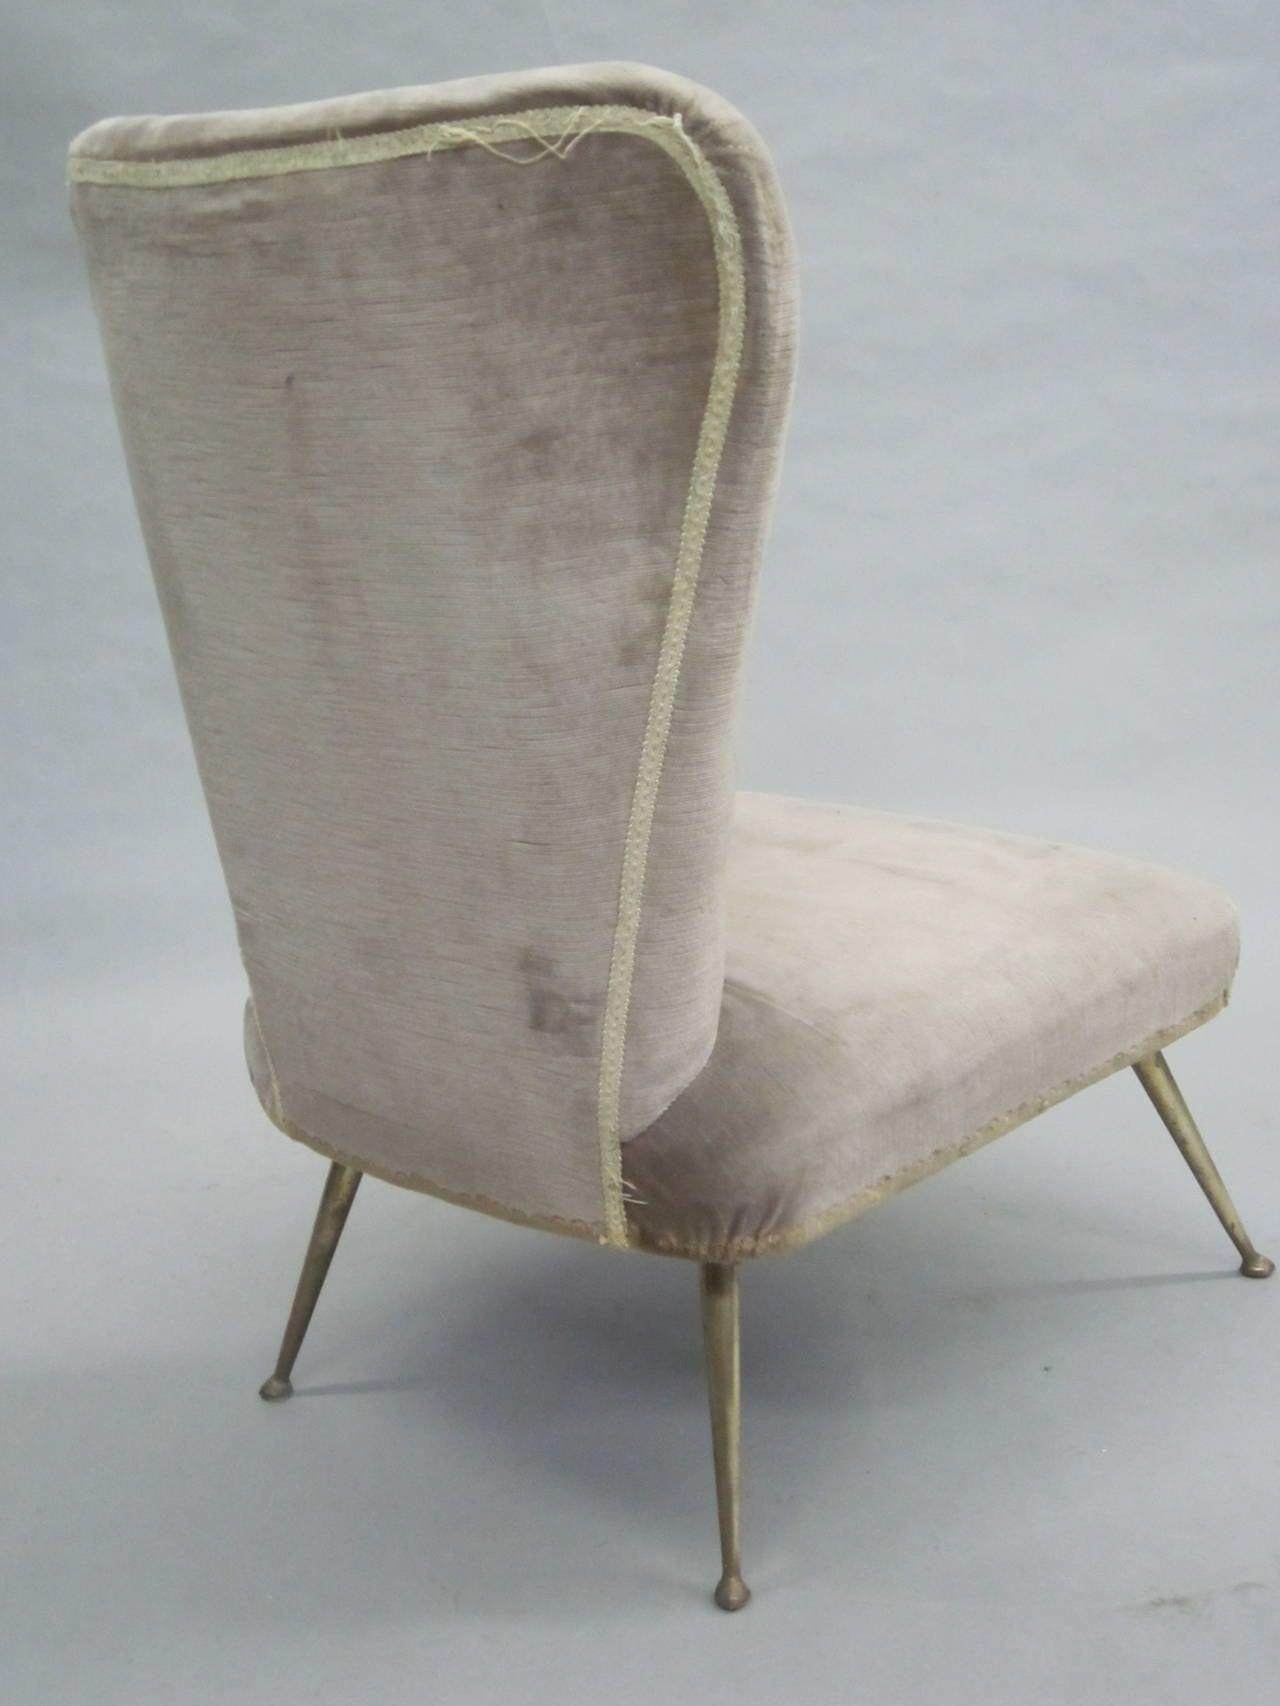 Pair of Italian Mid-Century Slipper Chairs Attributed to Marco Zanuso 4